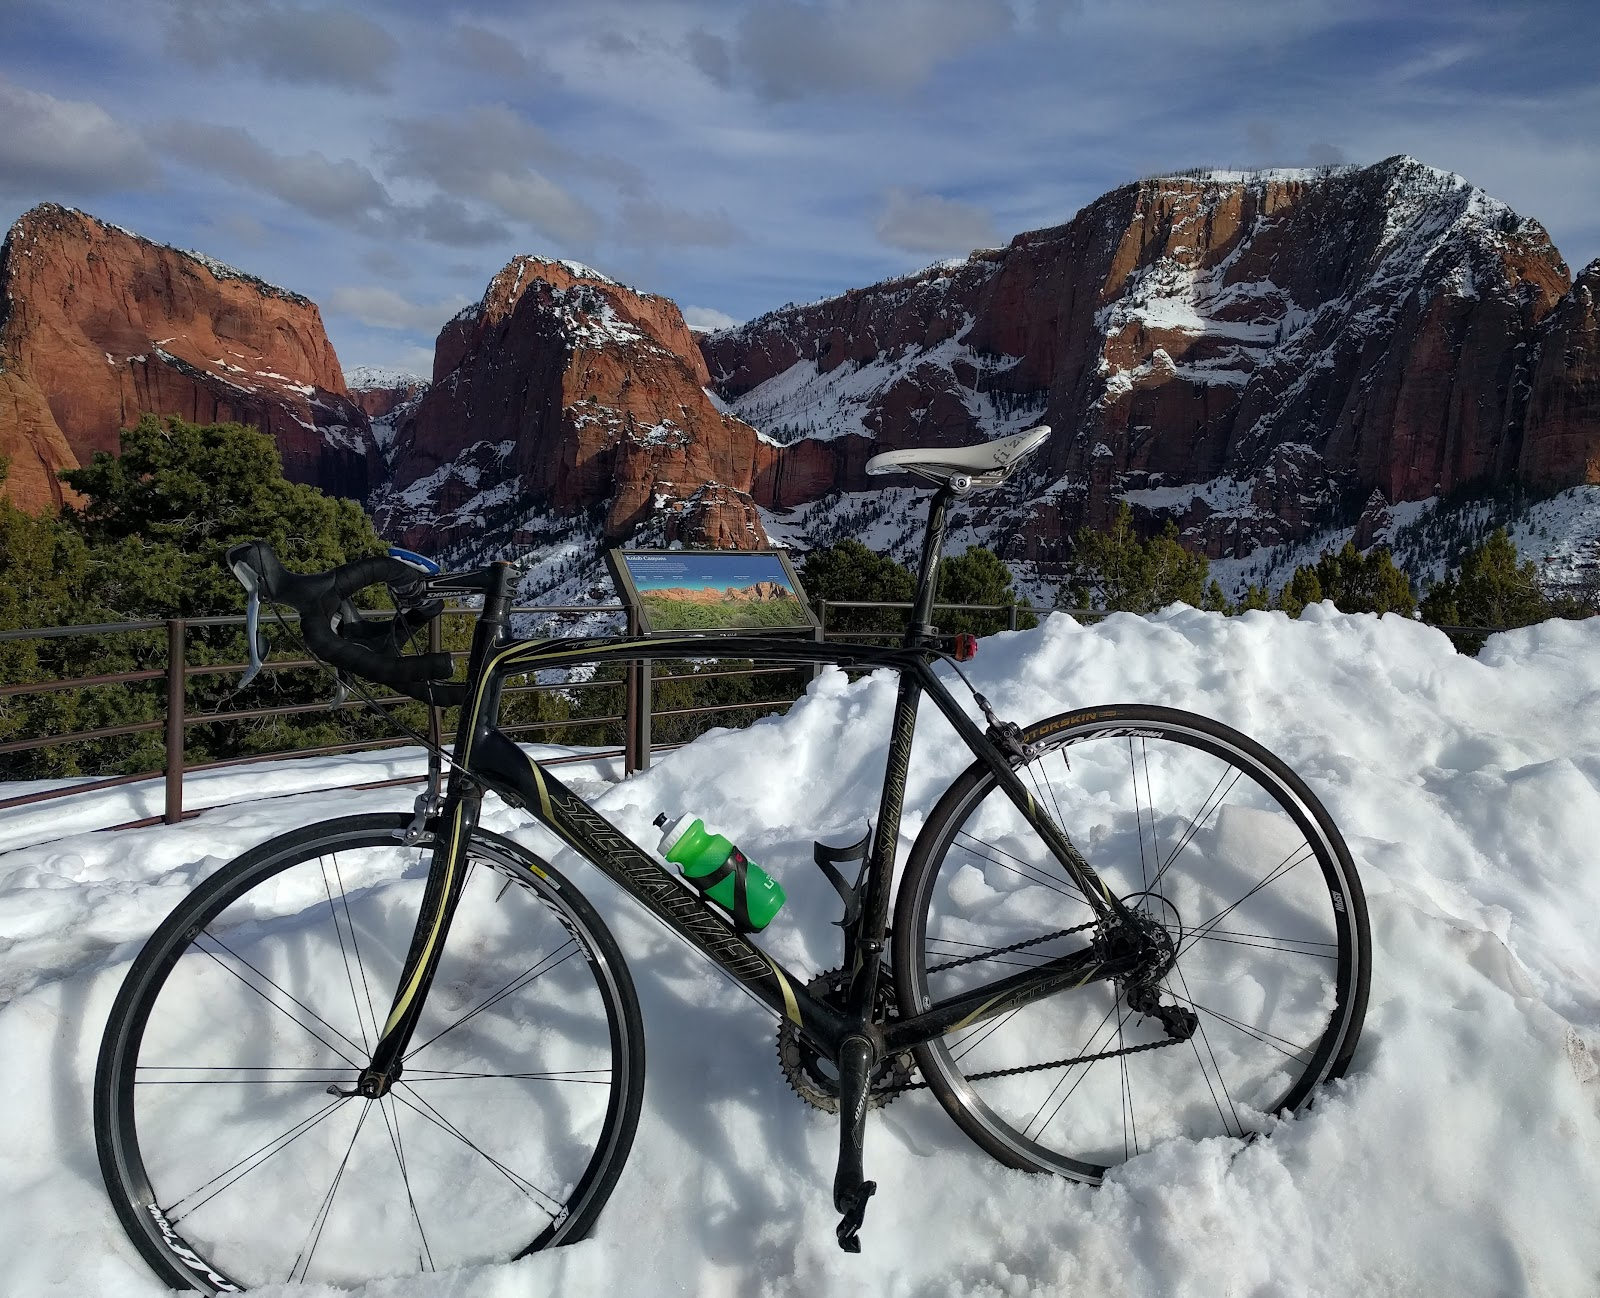 Cycling Kolob Terrace - bike on snowbank